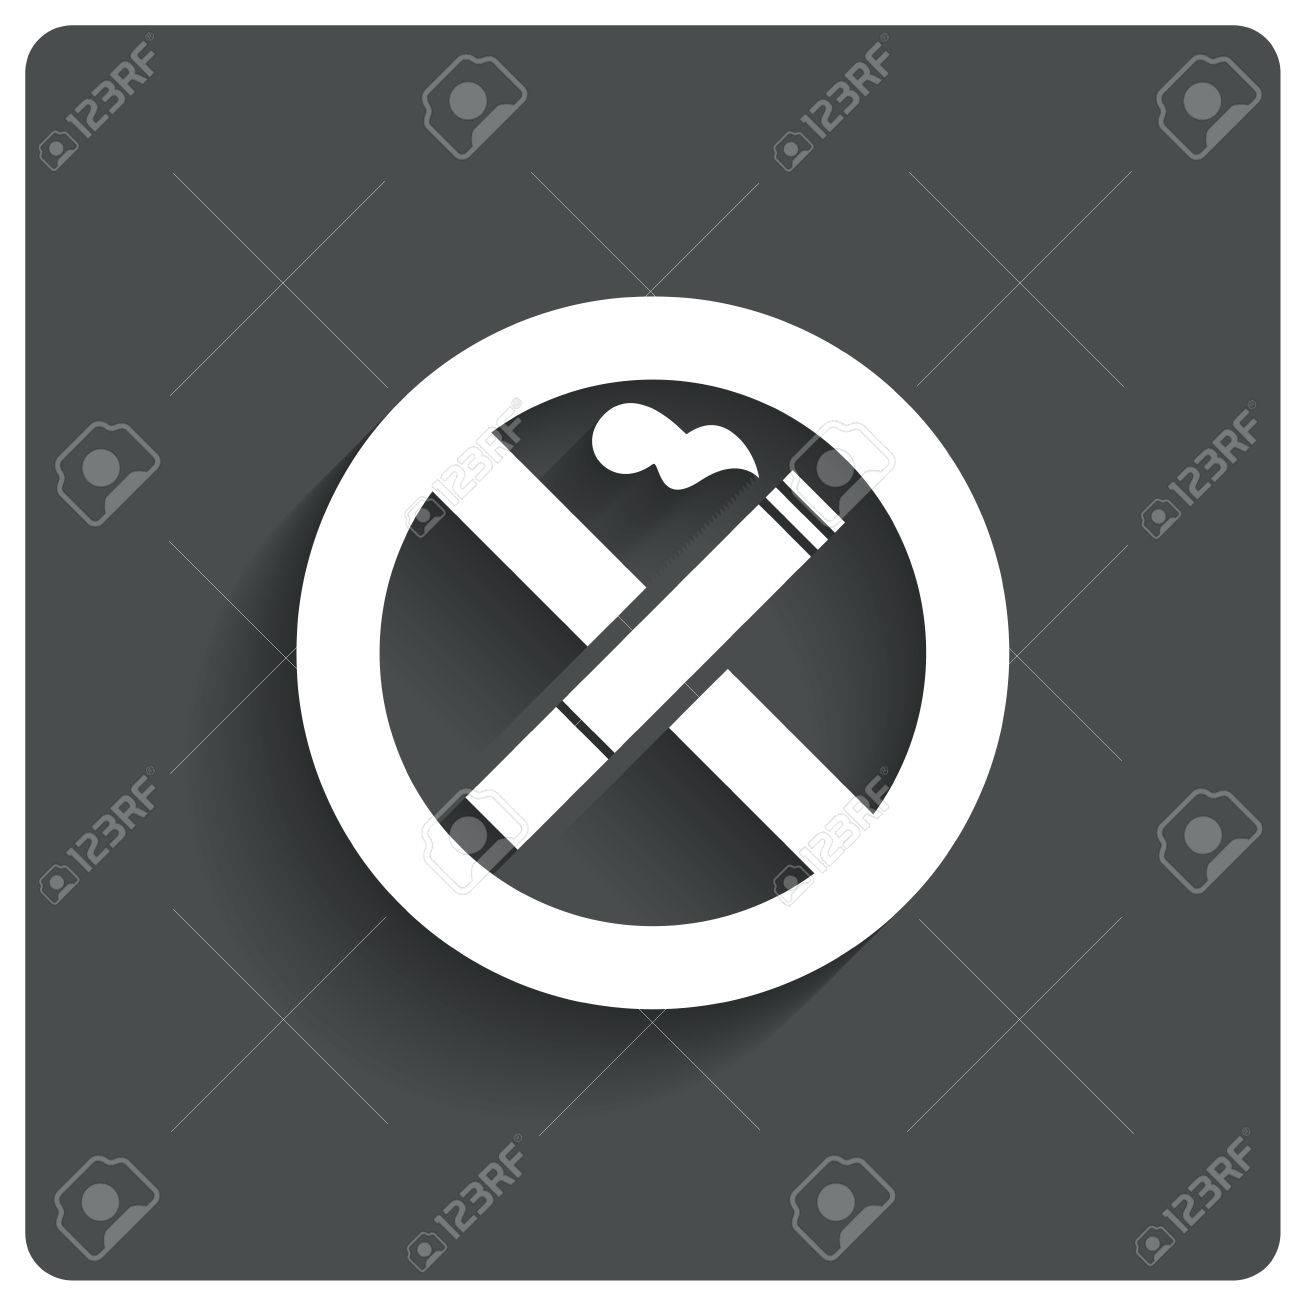 No smoking sign no smoke icon stop smoking symbol vector no smoking sign no smoke icon stop smoking symbol vector illustration filter biocorpaavc Image collections